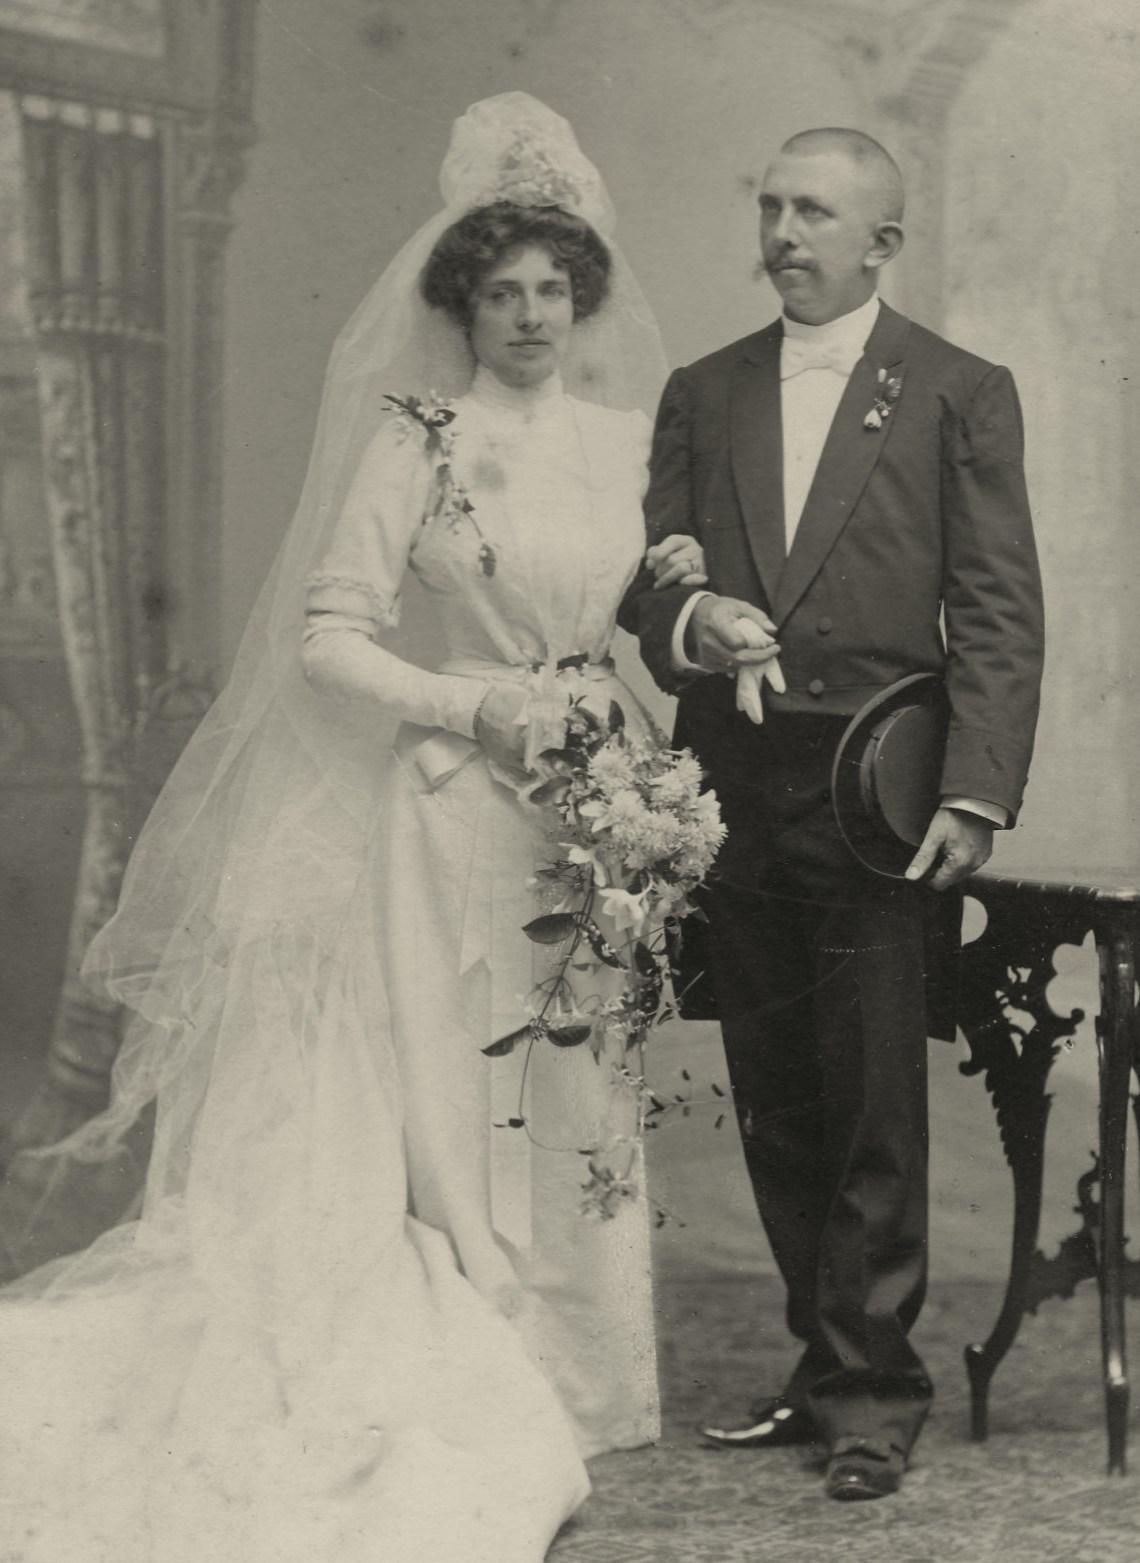 De ouders van Julie in 1901: Julie Frédérique Louise von Boddien (1863-1961) en Peter Jan van der Veen (1864-1923), administrateur van de suikerfabriek Soekowidi op Oost-Java